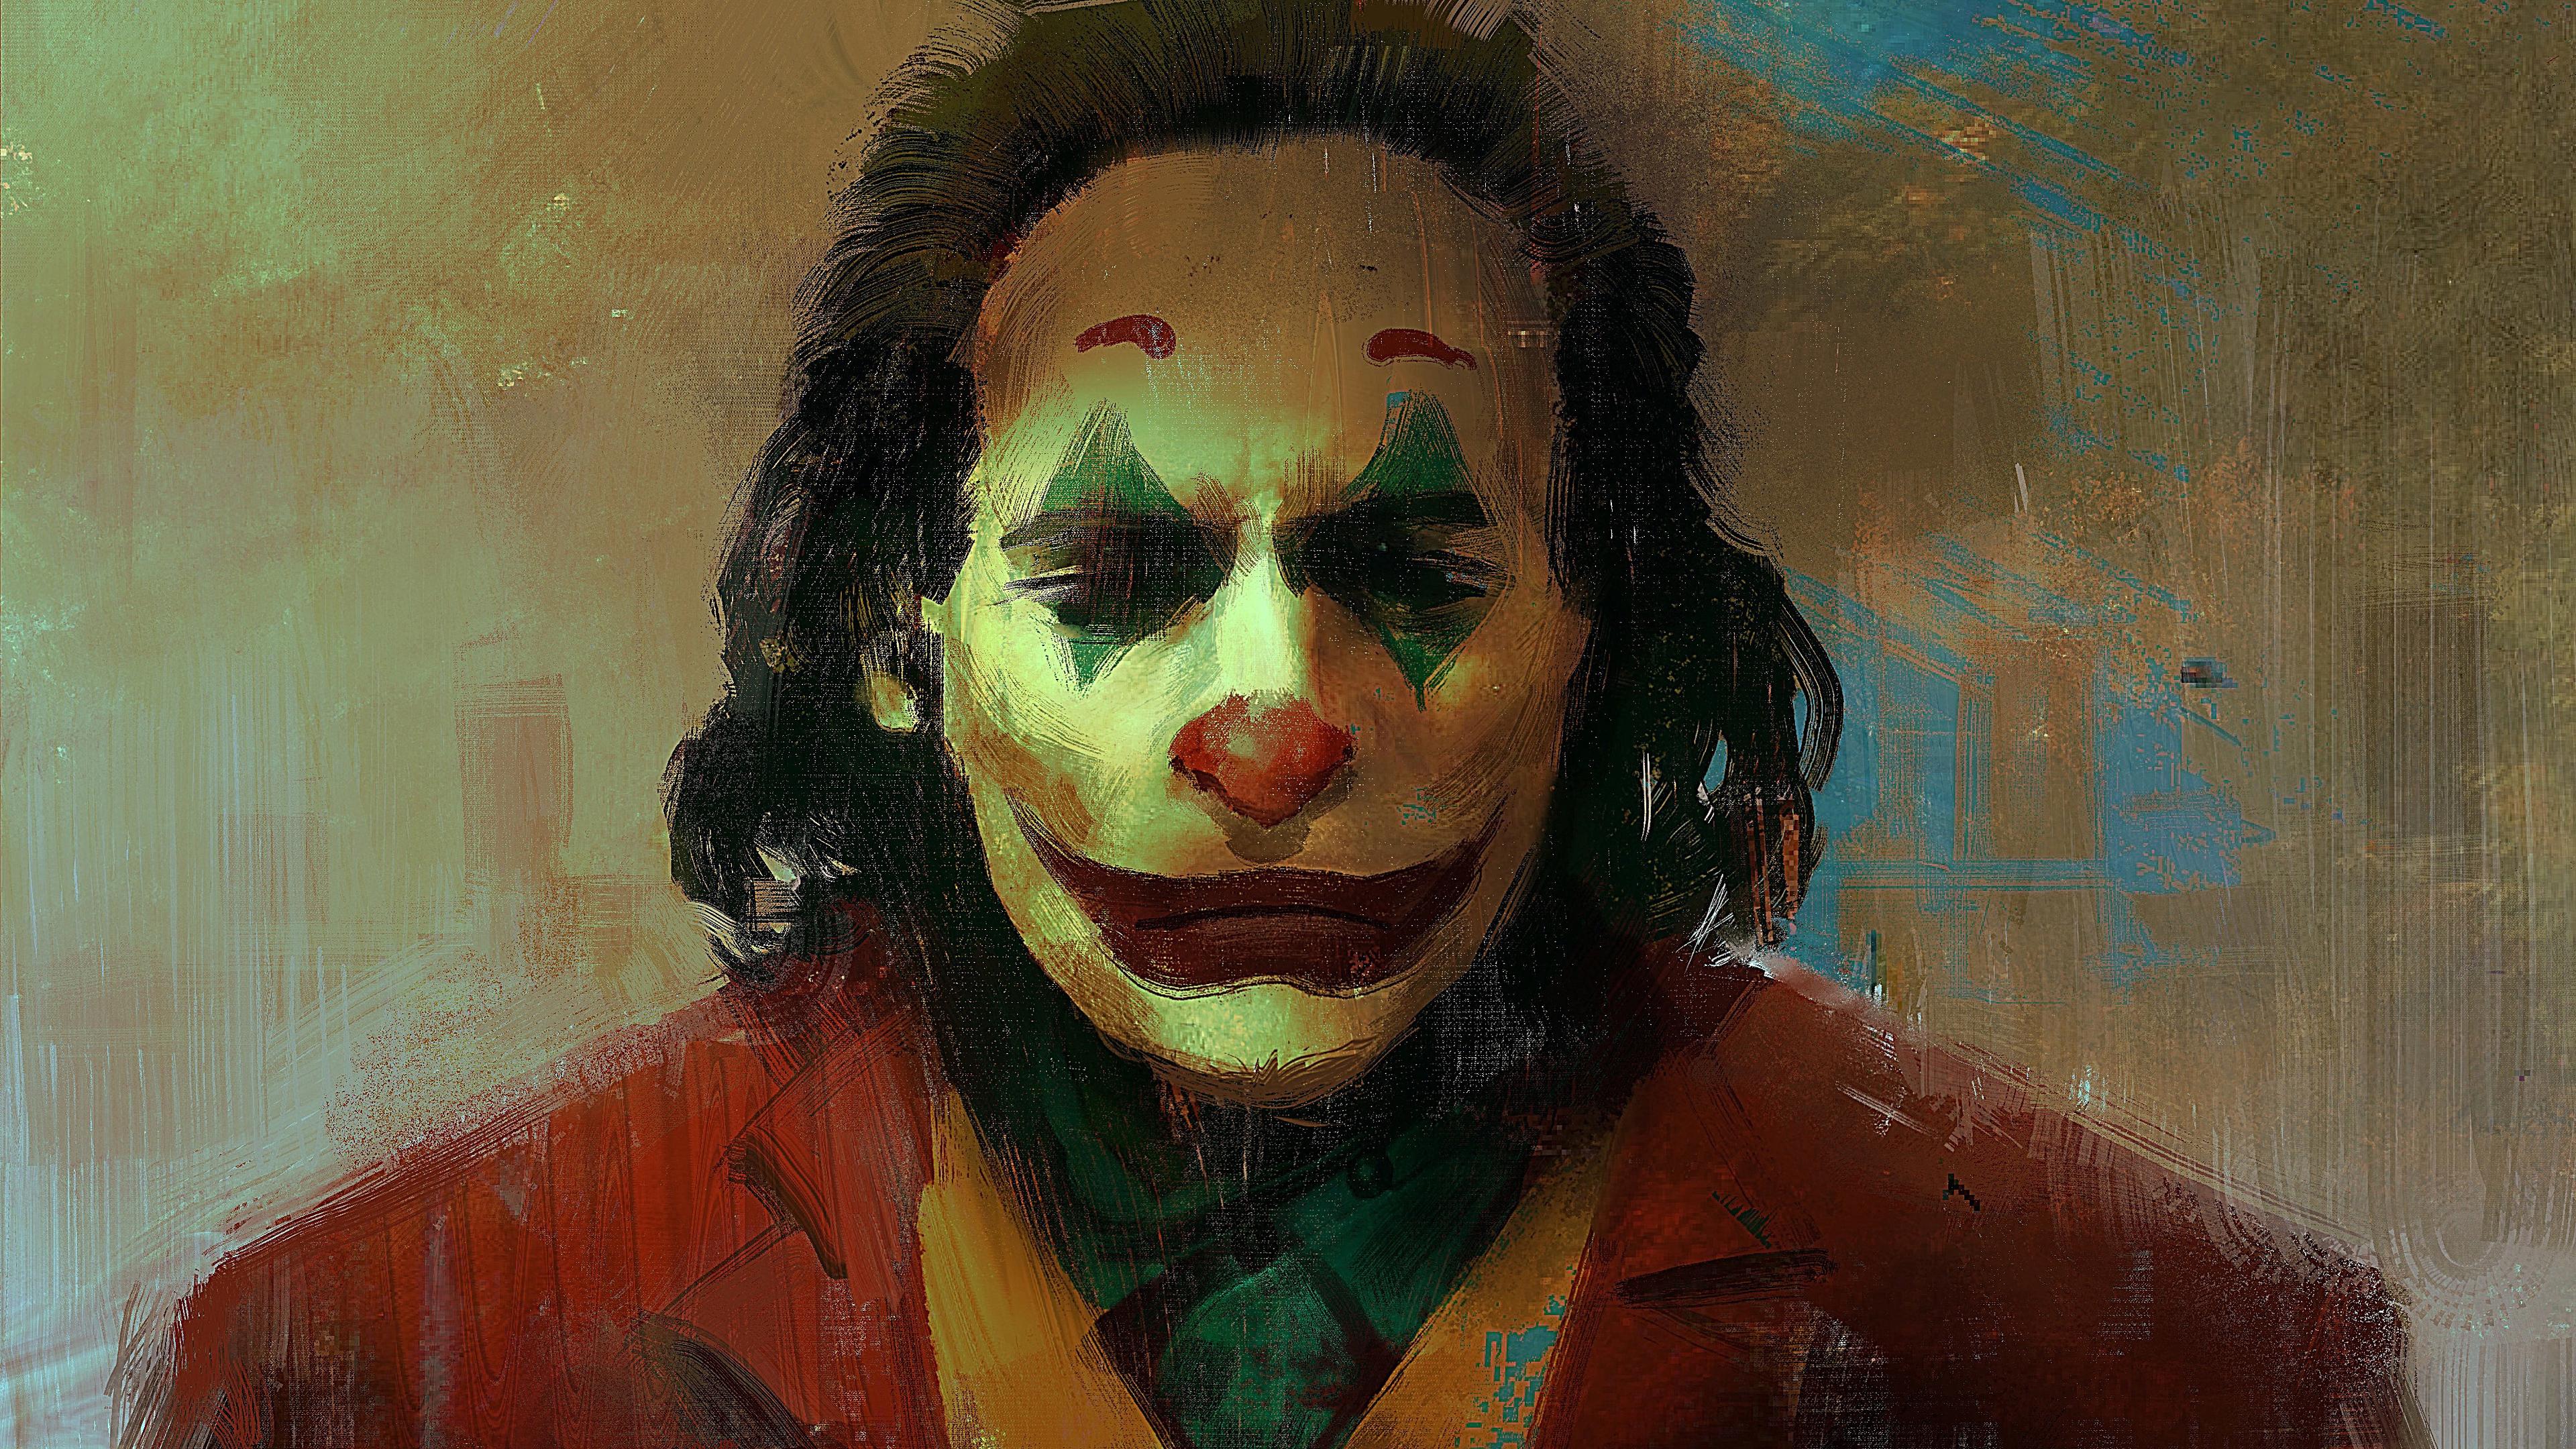 joker new 1572368604 - Joker New - supervillain wallpapers, superheroes wallpapers, joker wallpapers, joker movie wallpapers, hd-wallpapers, 4k-wallpapers